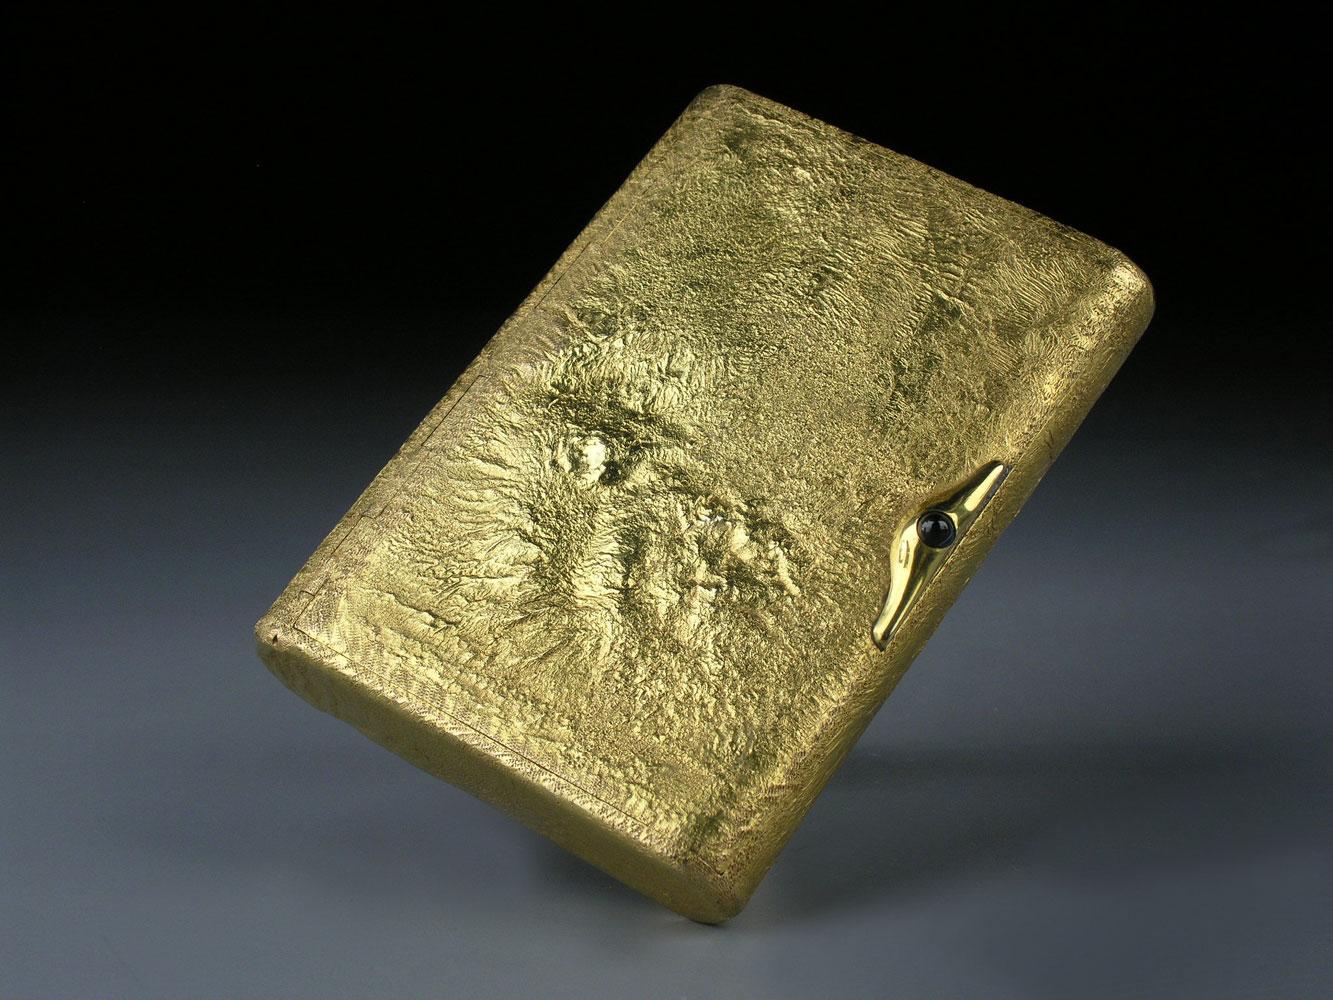 Russische Gold-Zigarettendose